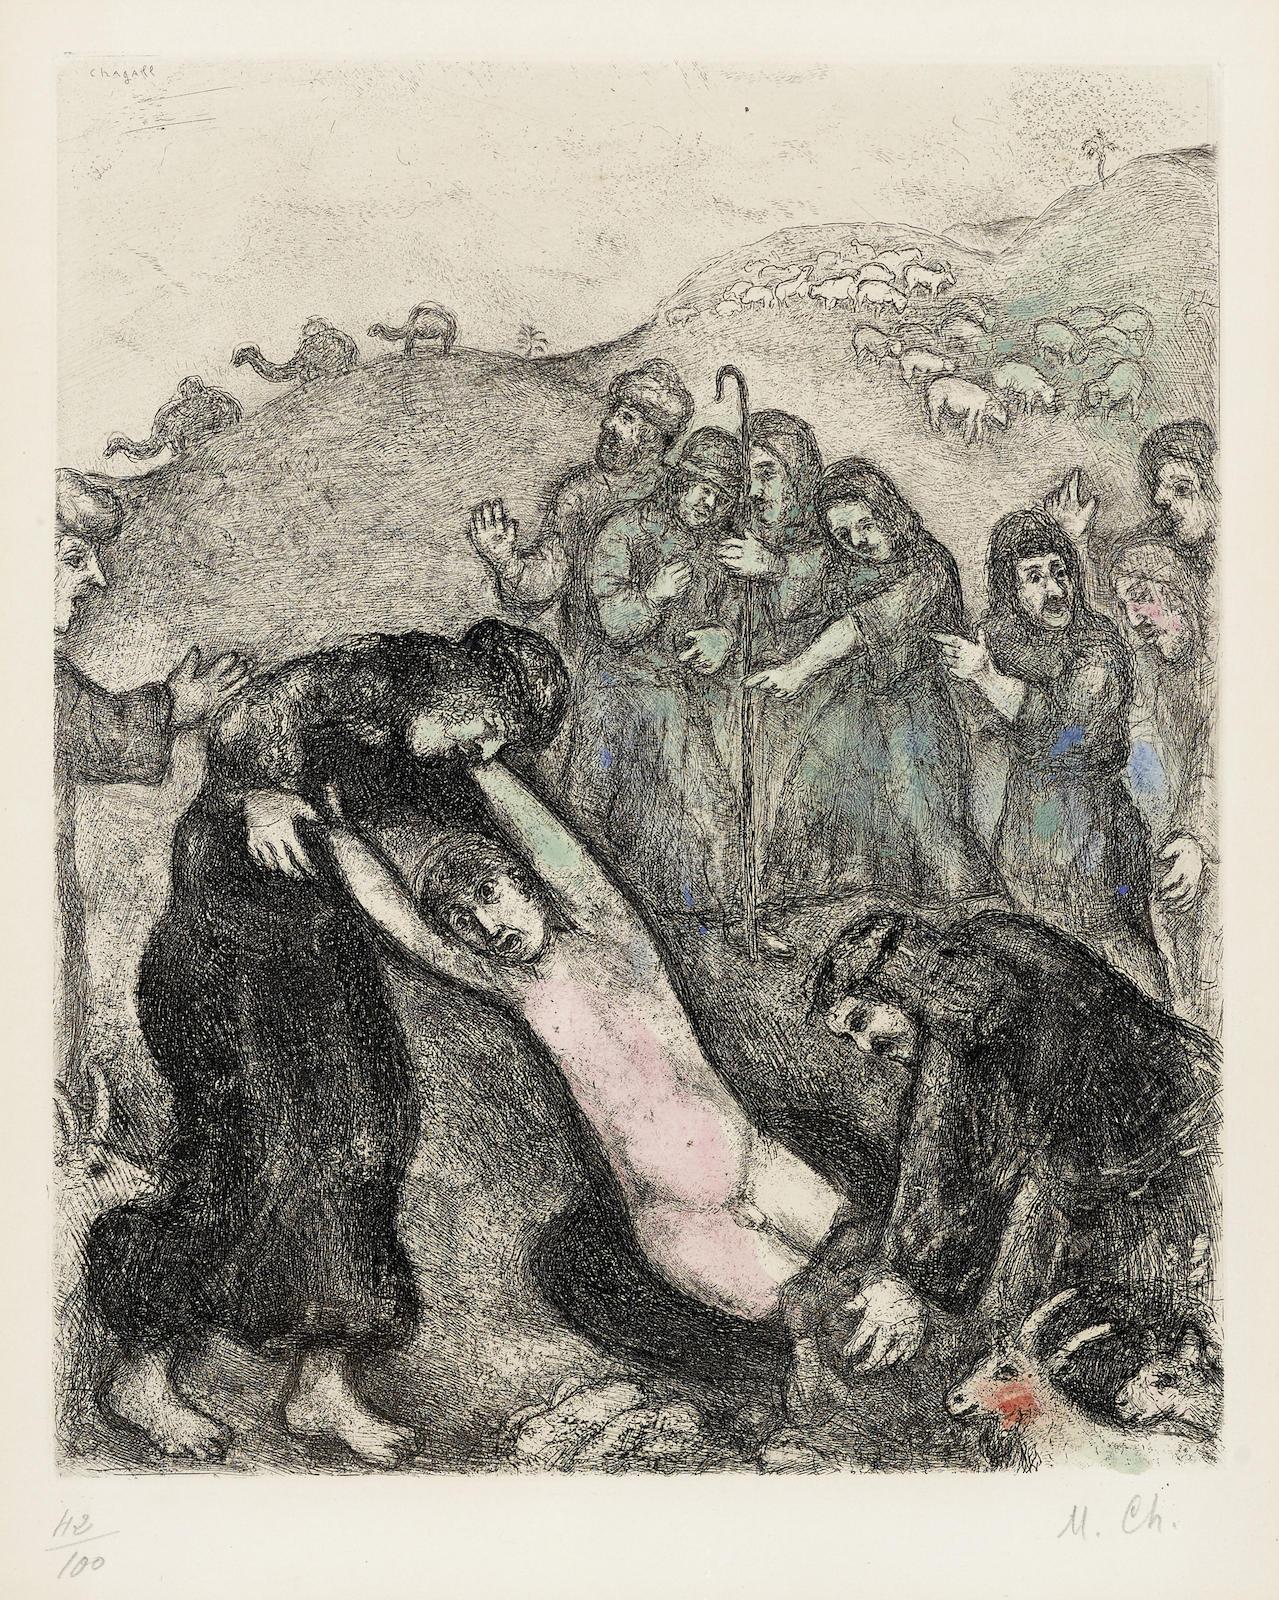 Marc Chagall-Joseph Et Ses Freres, Pl. 19, From La Bible (V. 216; C. Bk. 30)-1939